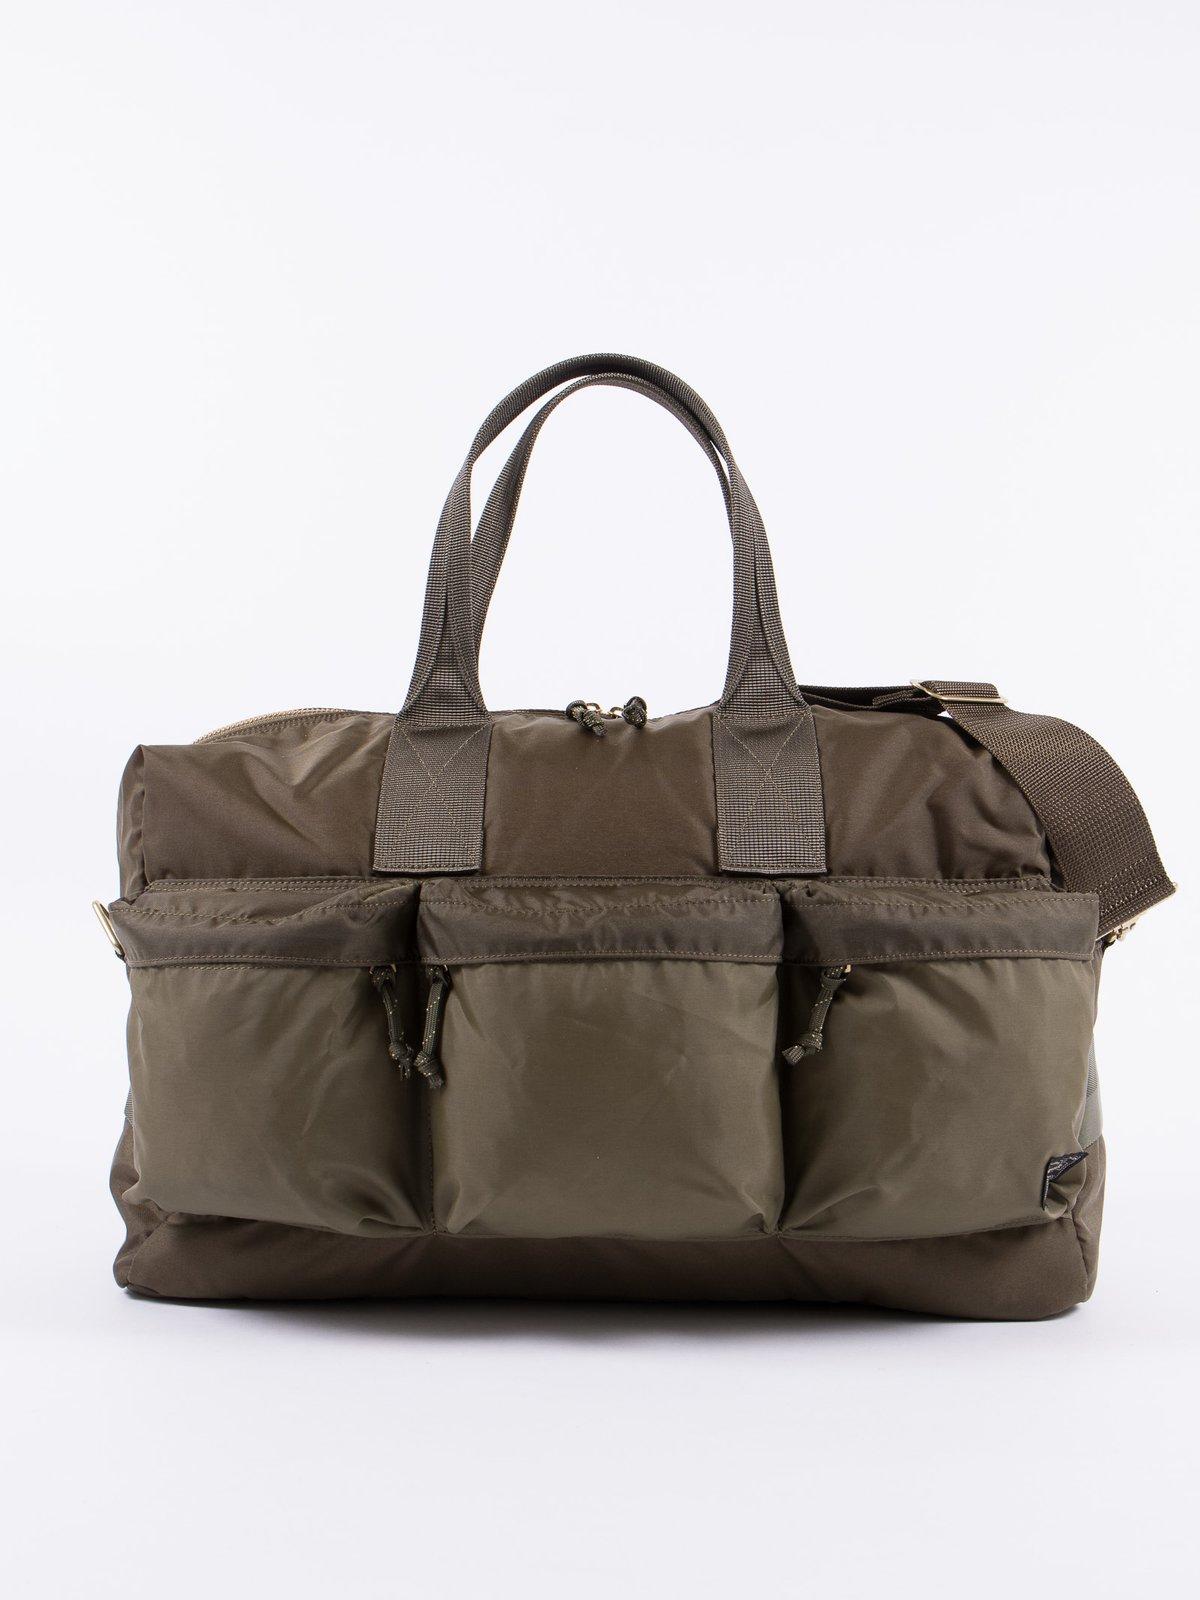 42f10fbcd5 Olive Force 2Way Duffle Bag by Porter – Yoshida   Co Ltd – The ...